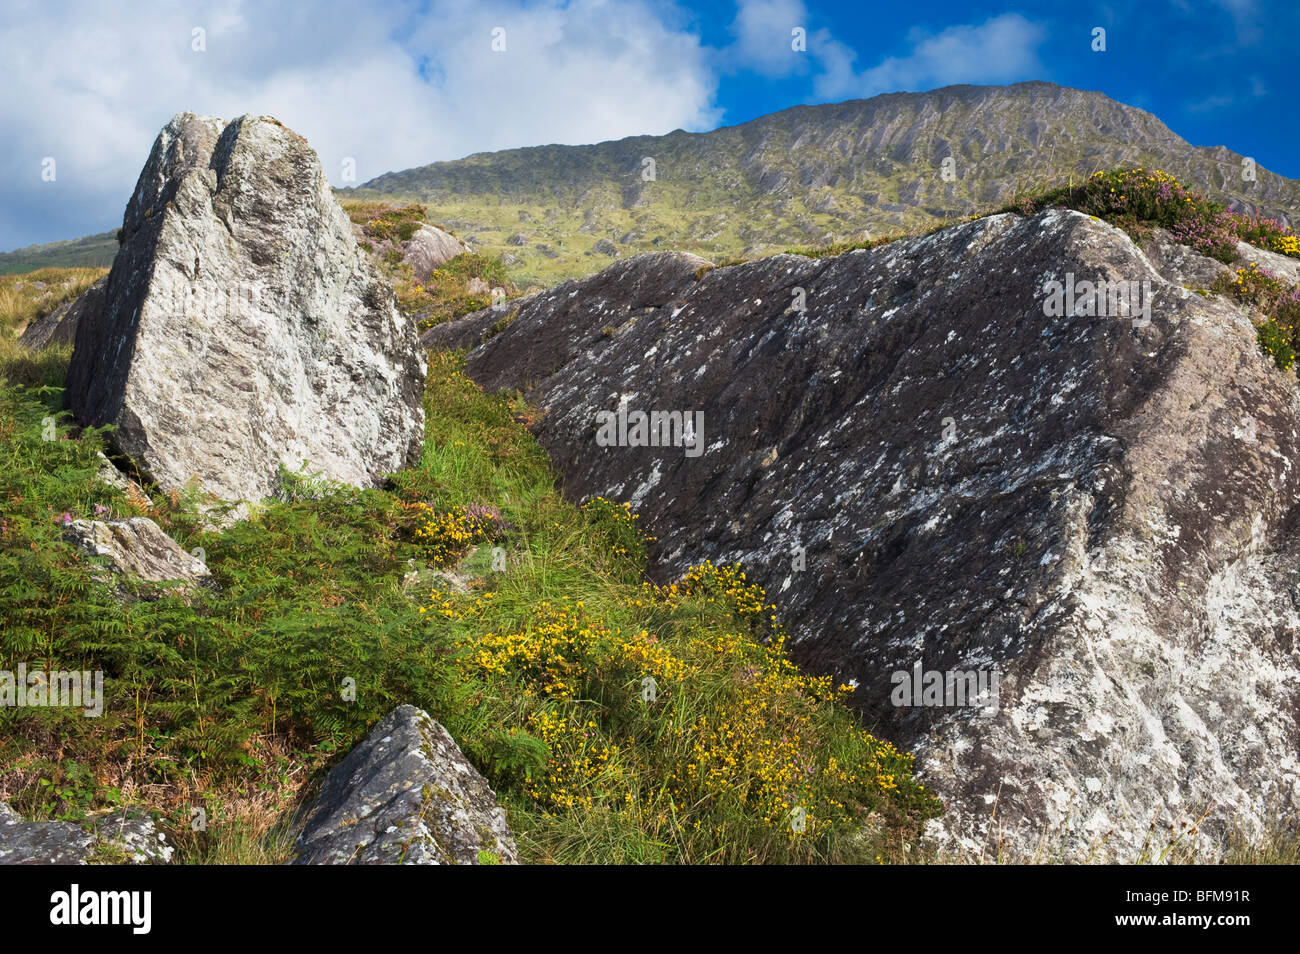 Sugarloaf Mountain, Beara, West Cork, Ireland - Stock Image